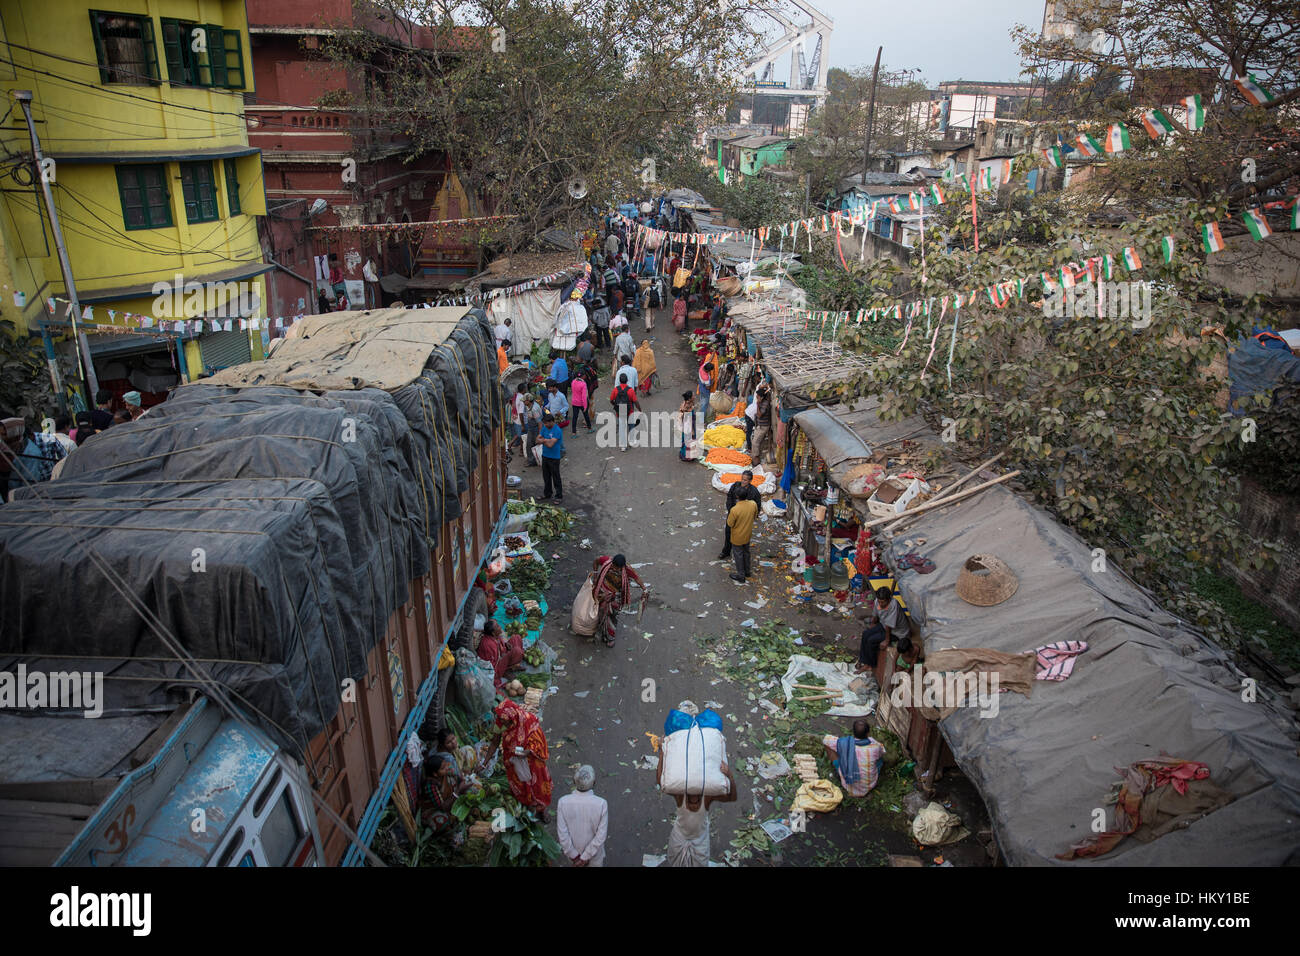 Mallick Flower Market in Kolkata (Calcutta), West Bengal, India. - Stock Image